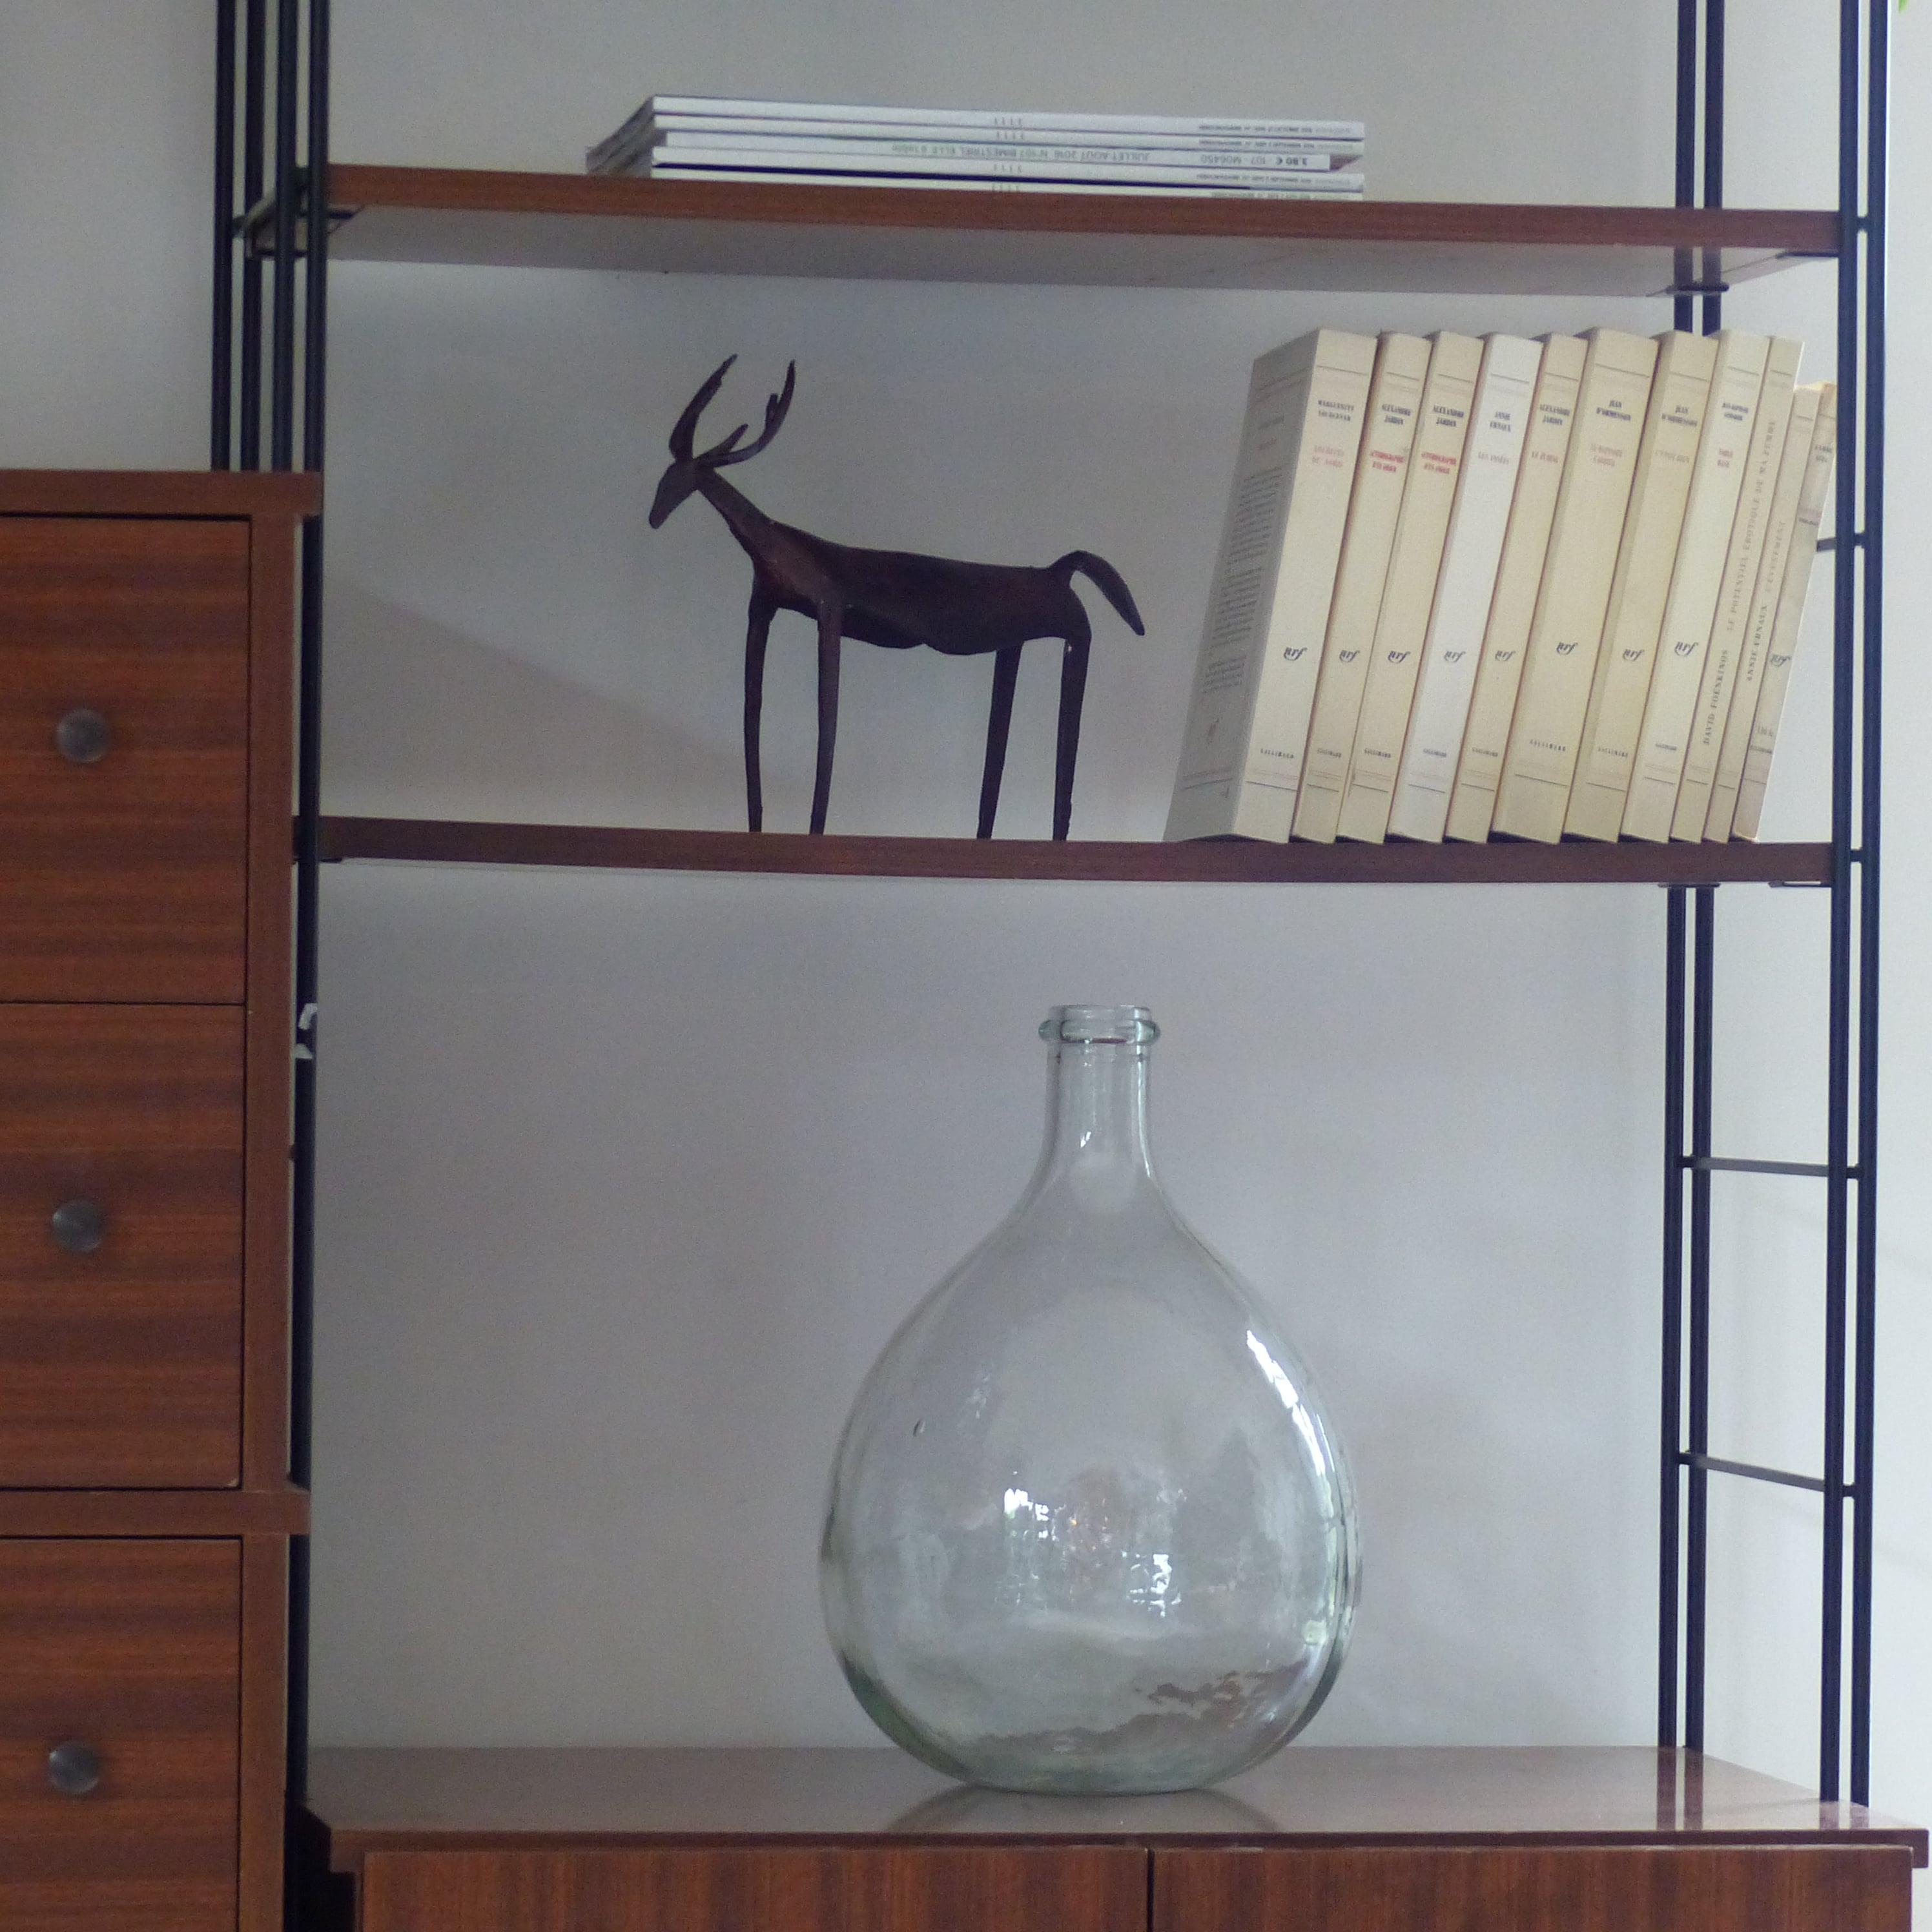 etag re biblioth que murale modulable vintage. Black Bedroom Furniture Sets. Home Design Ideas